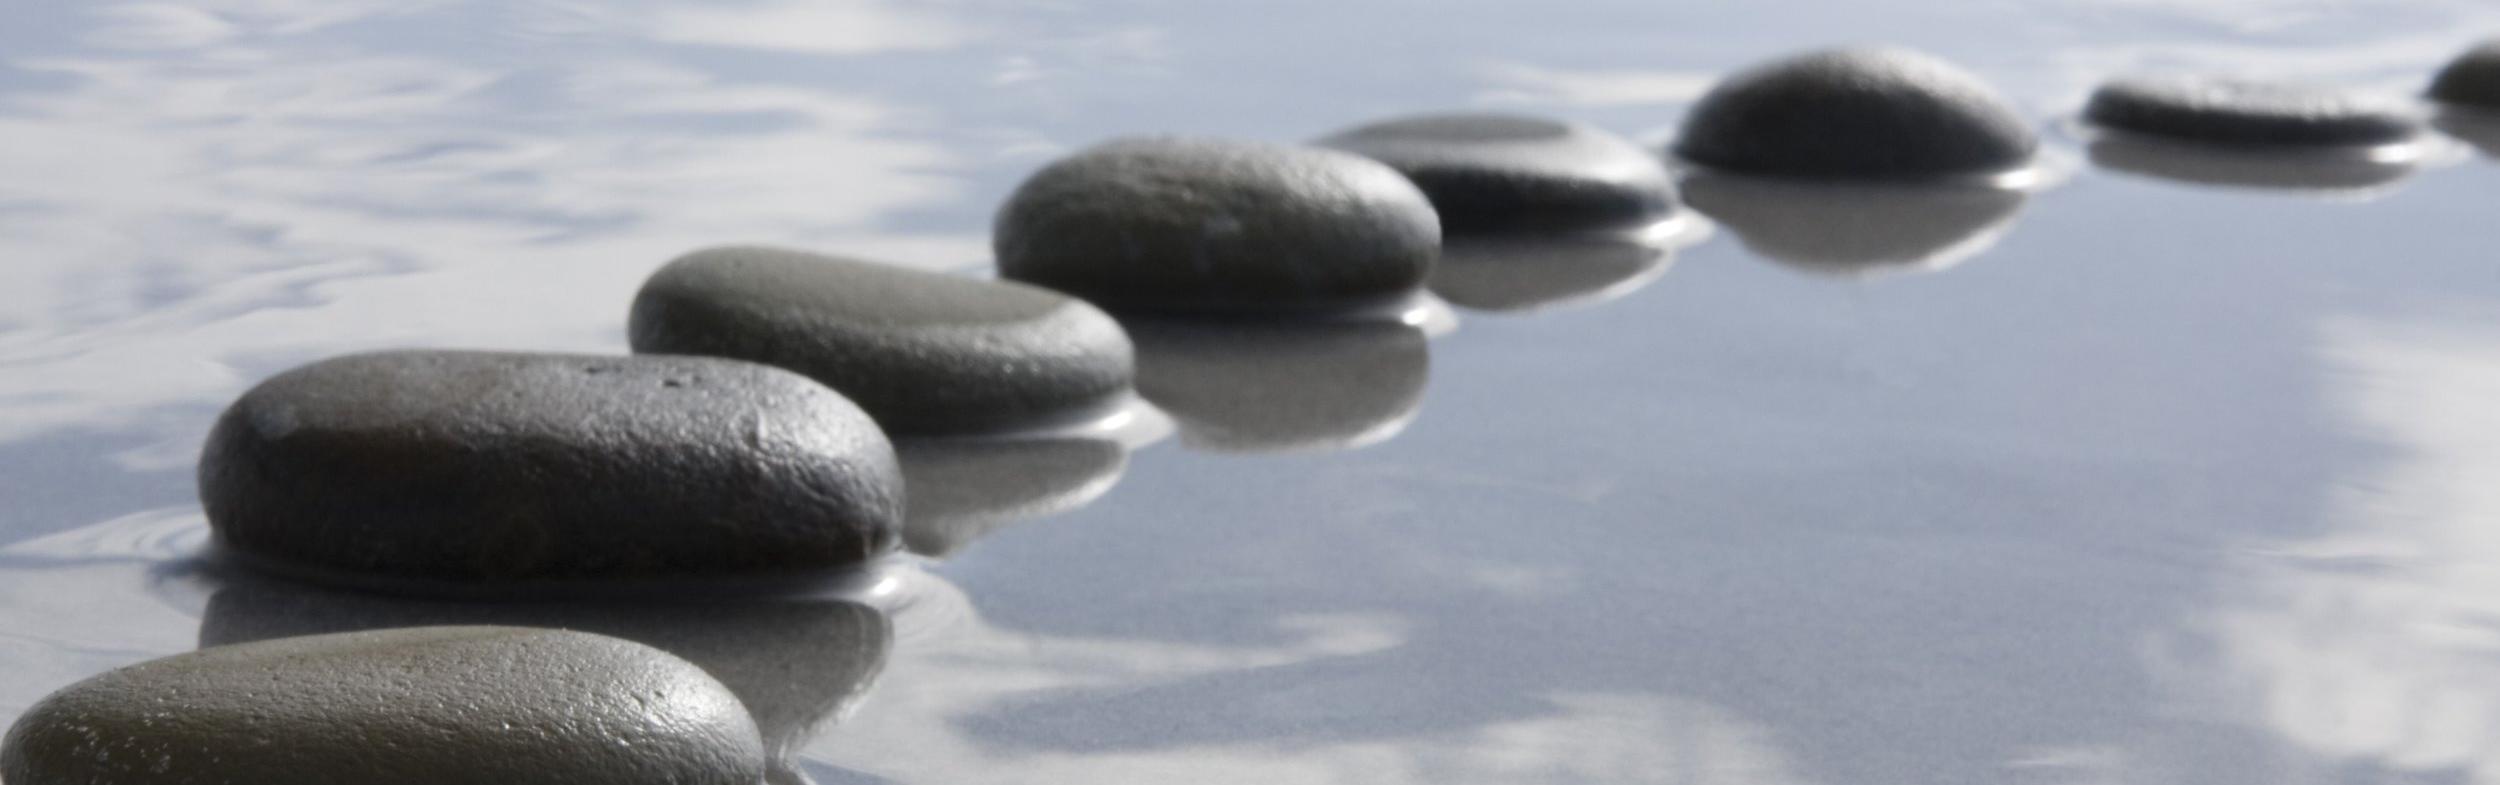 Stepping-Stones2[1].jpg